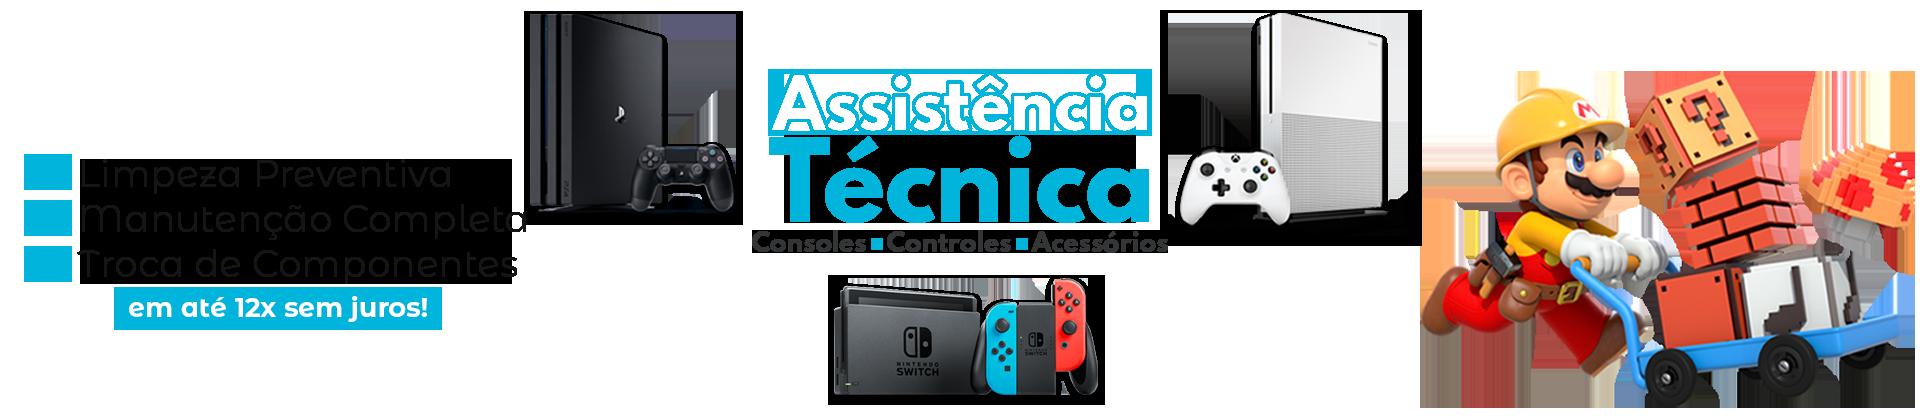 Manutenção_Assistencia_Banner_Full